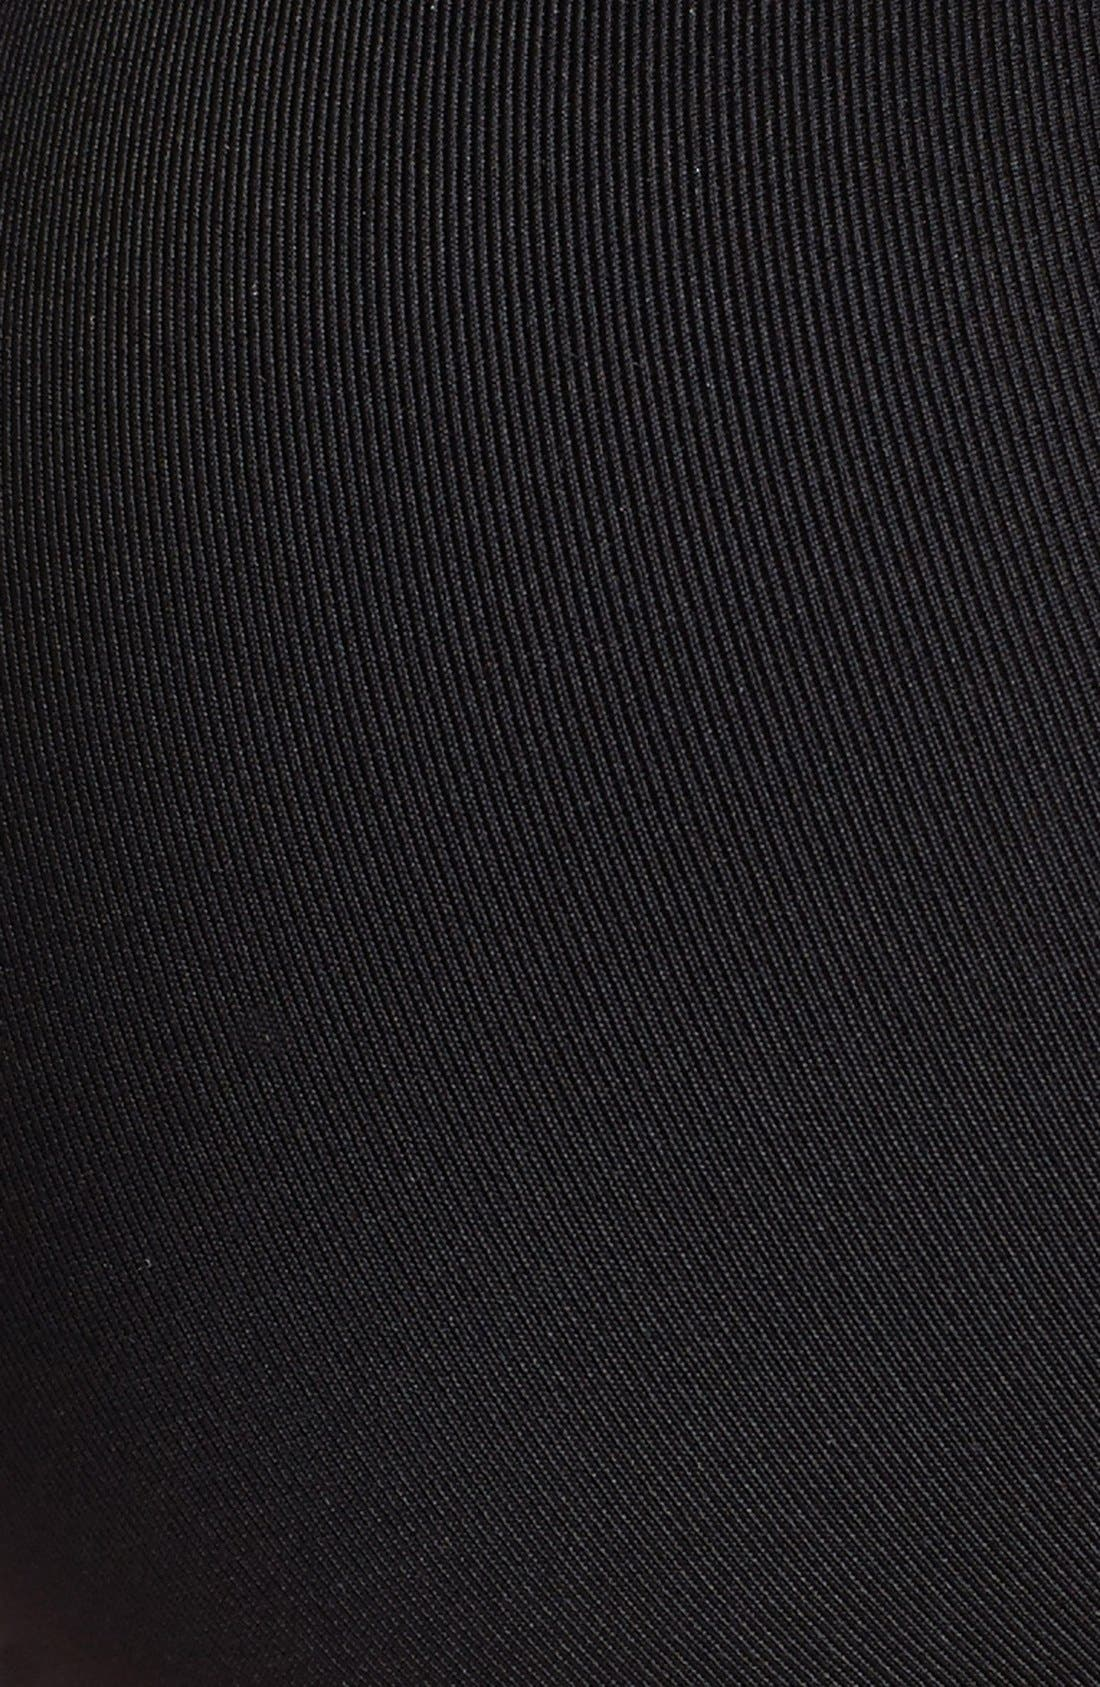 'Lara' Soft Cup Bra,                             Alternate thumbnail 5, color,                             BLACK